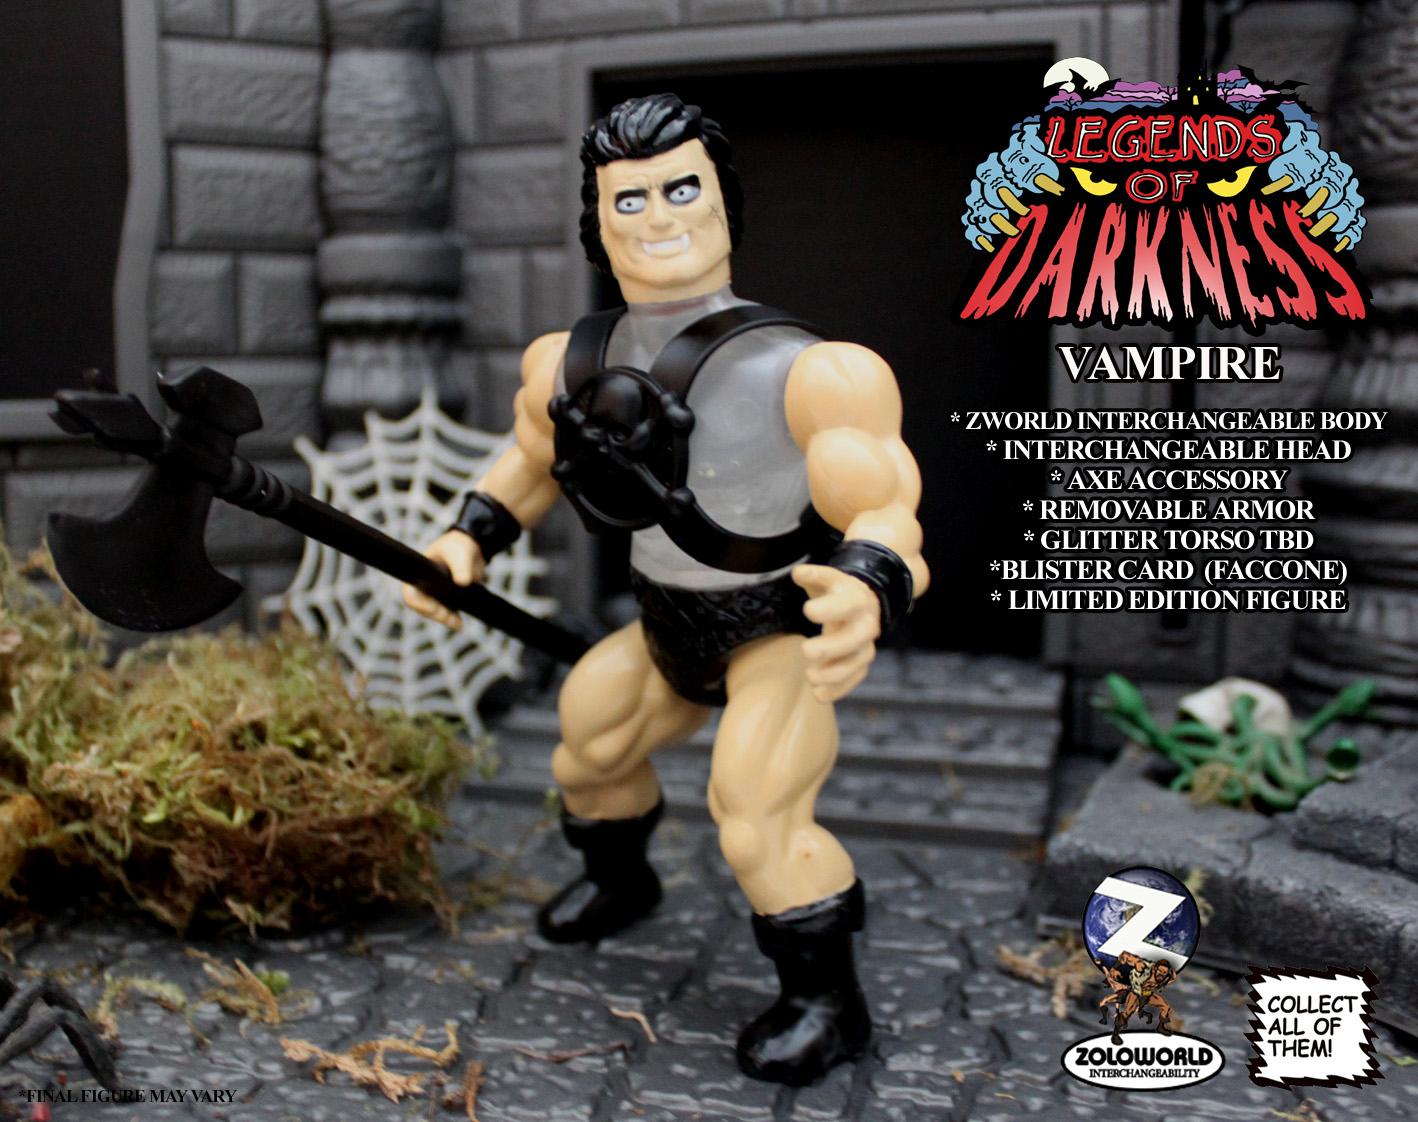 Legends of Darkness: VAMPIRE by Zoloworld